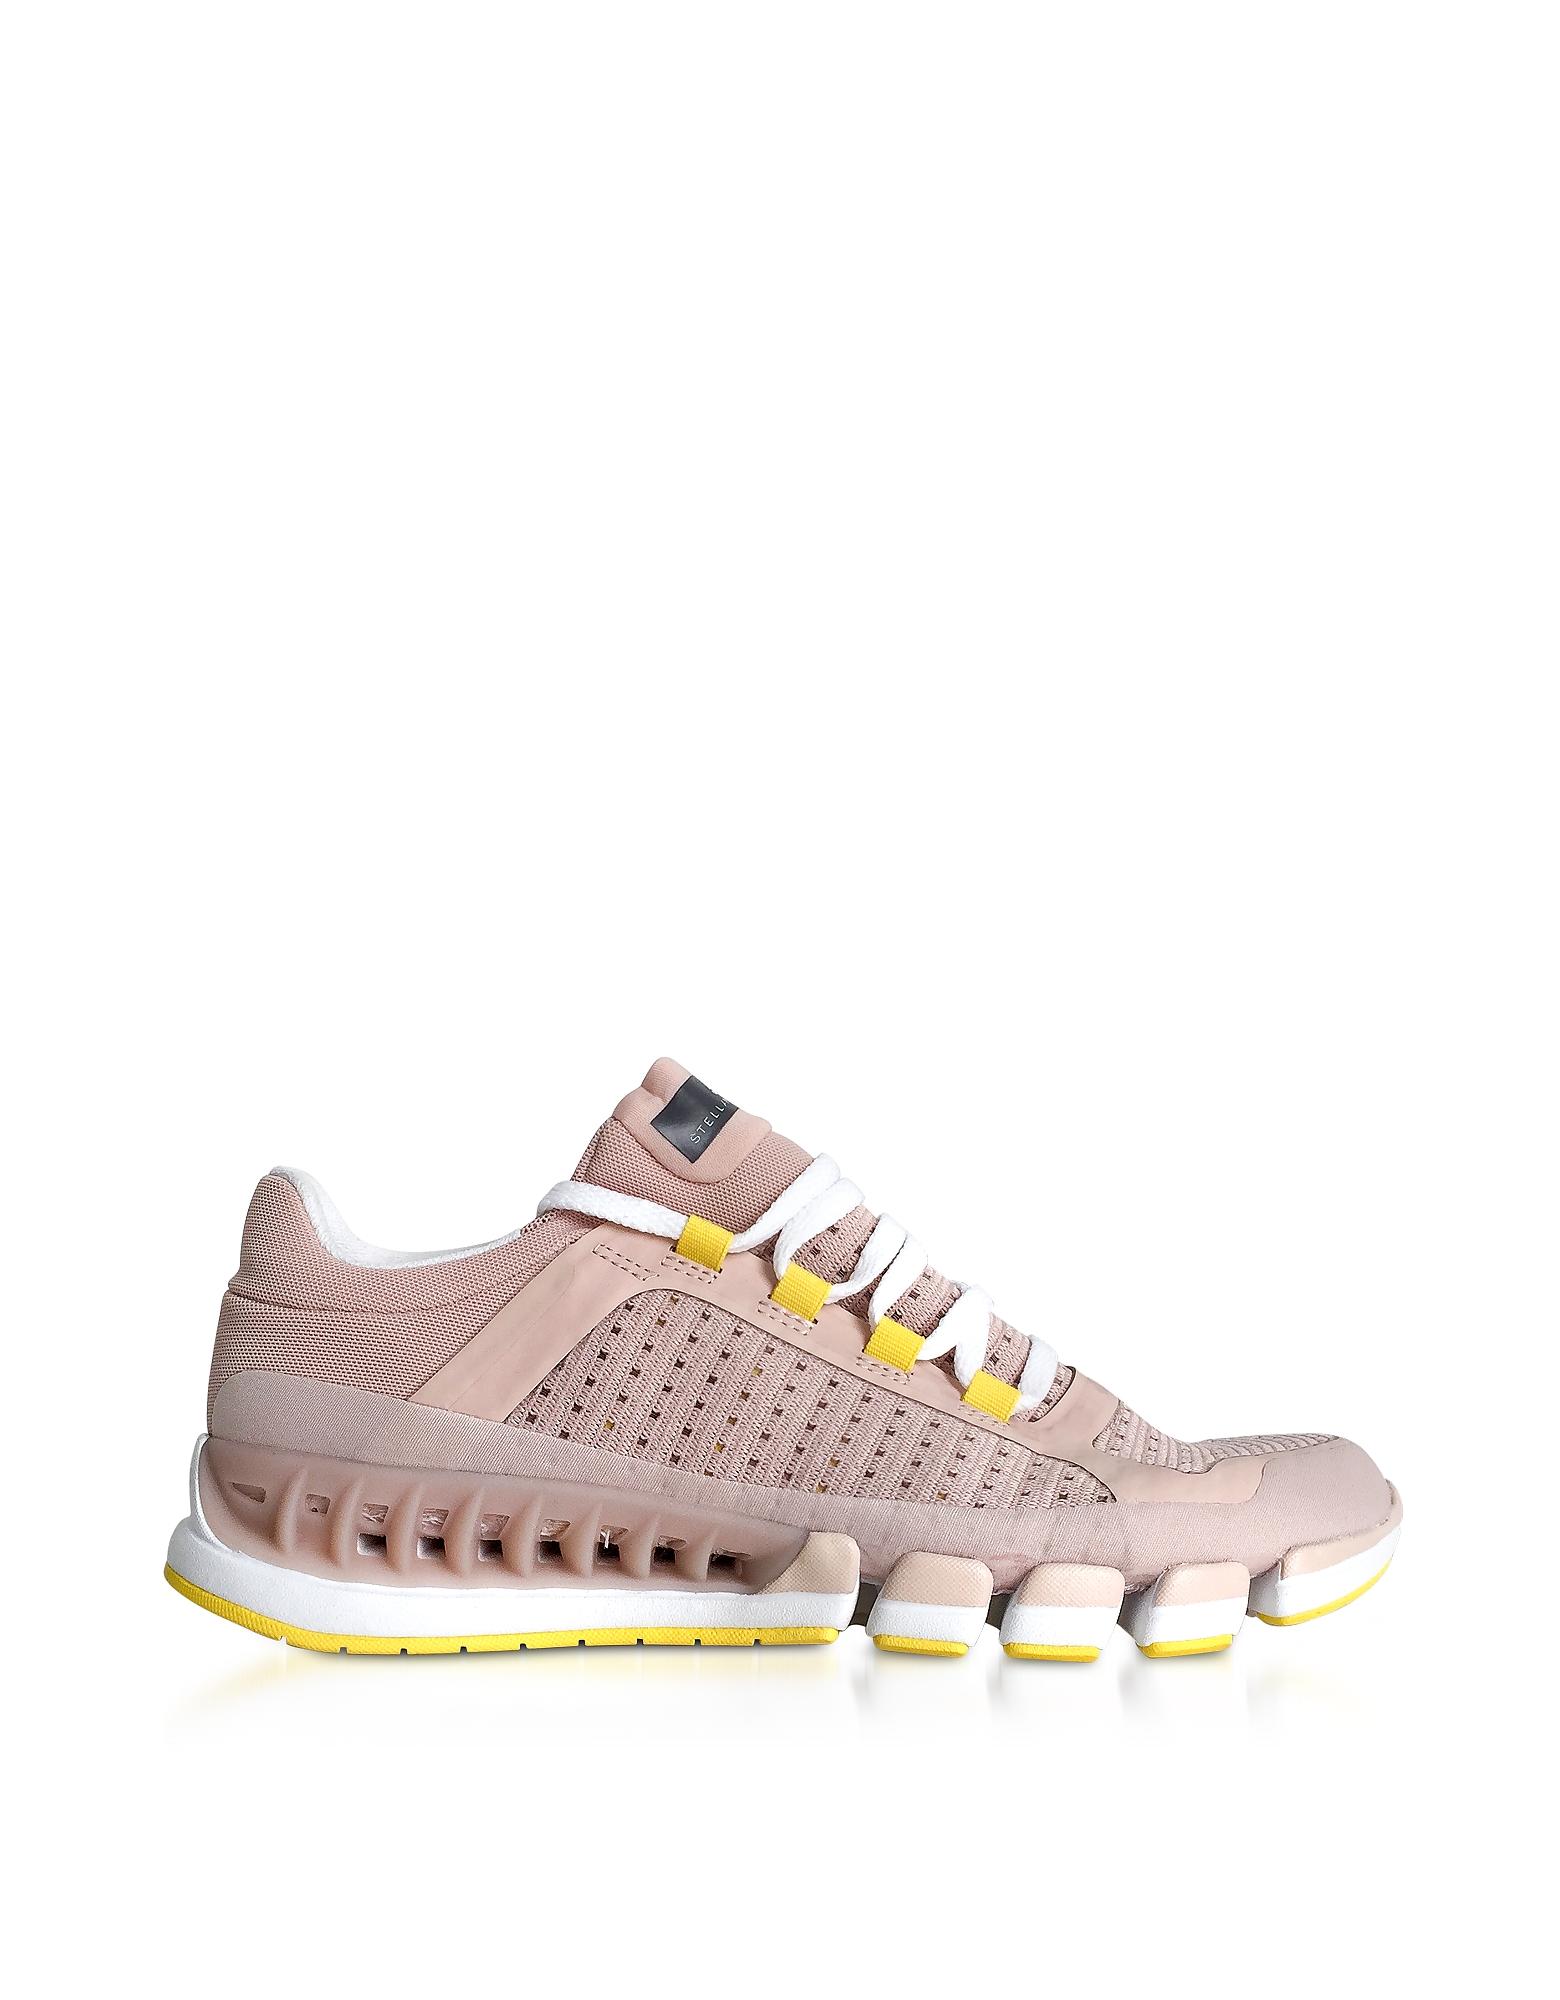 Adidas Stella McCartney Shoes, Pearl Rose CC Revolution W Trainers